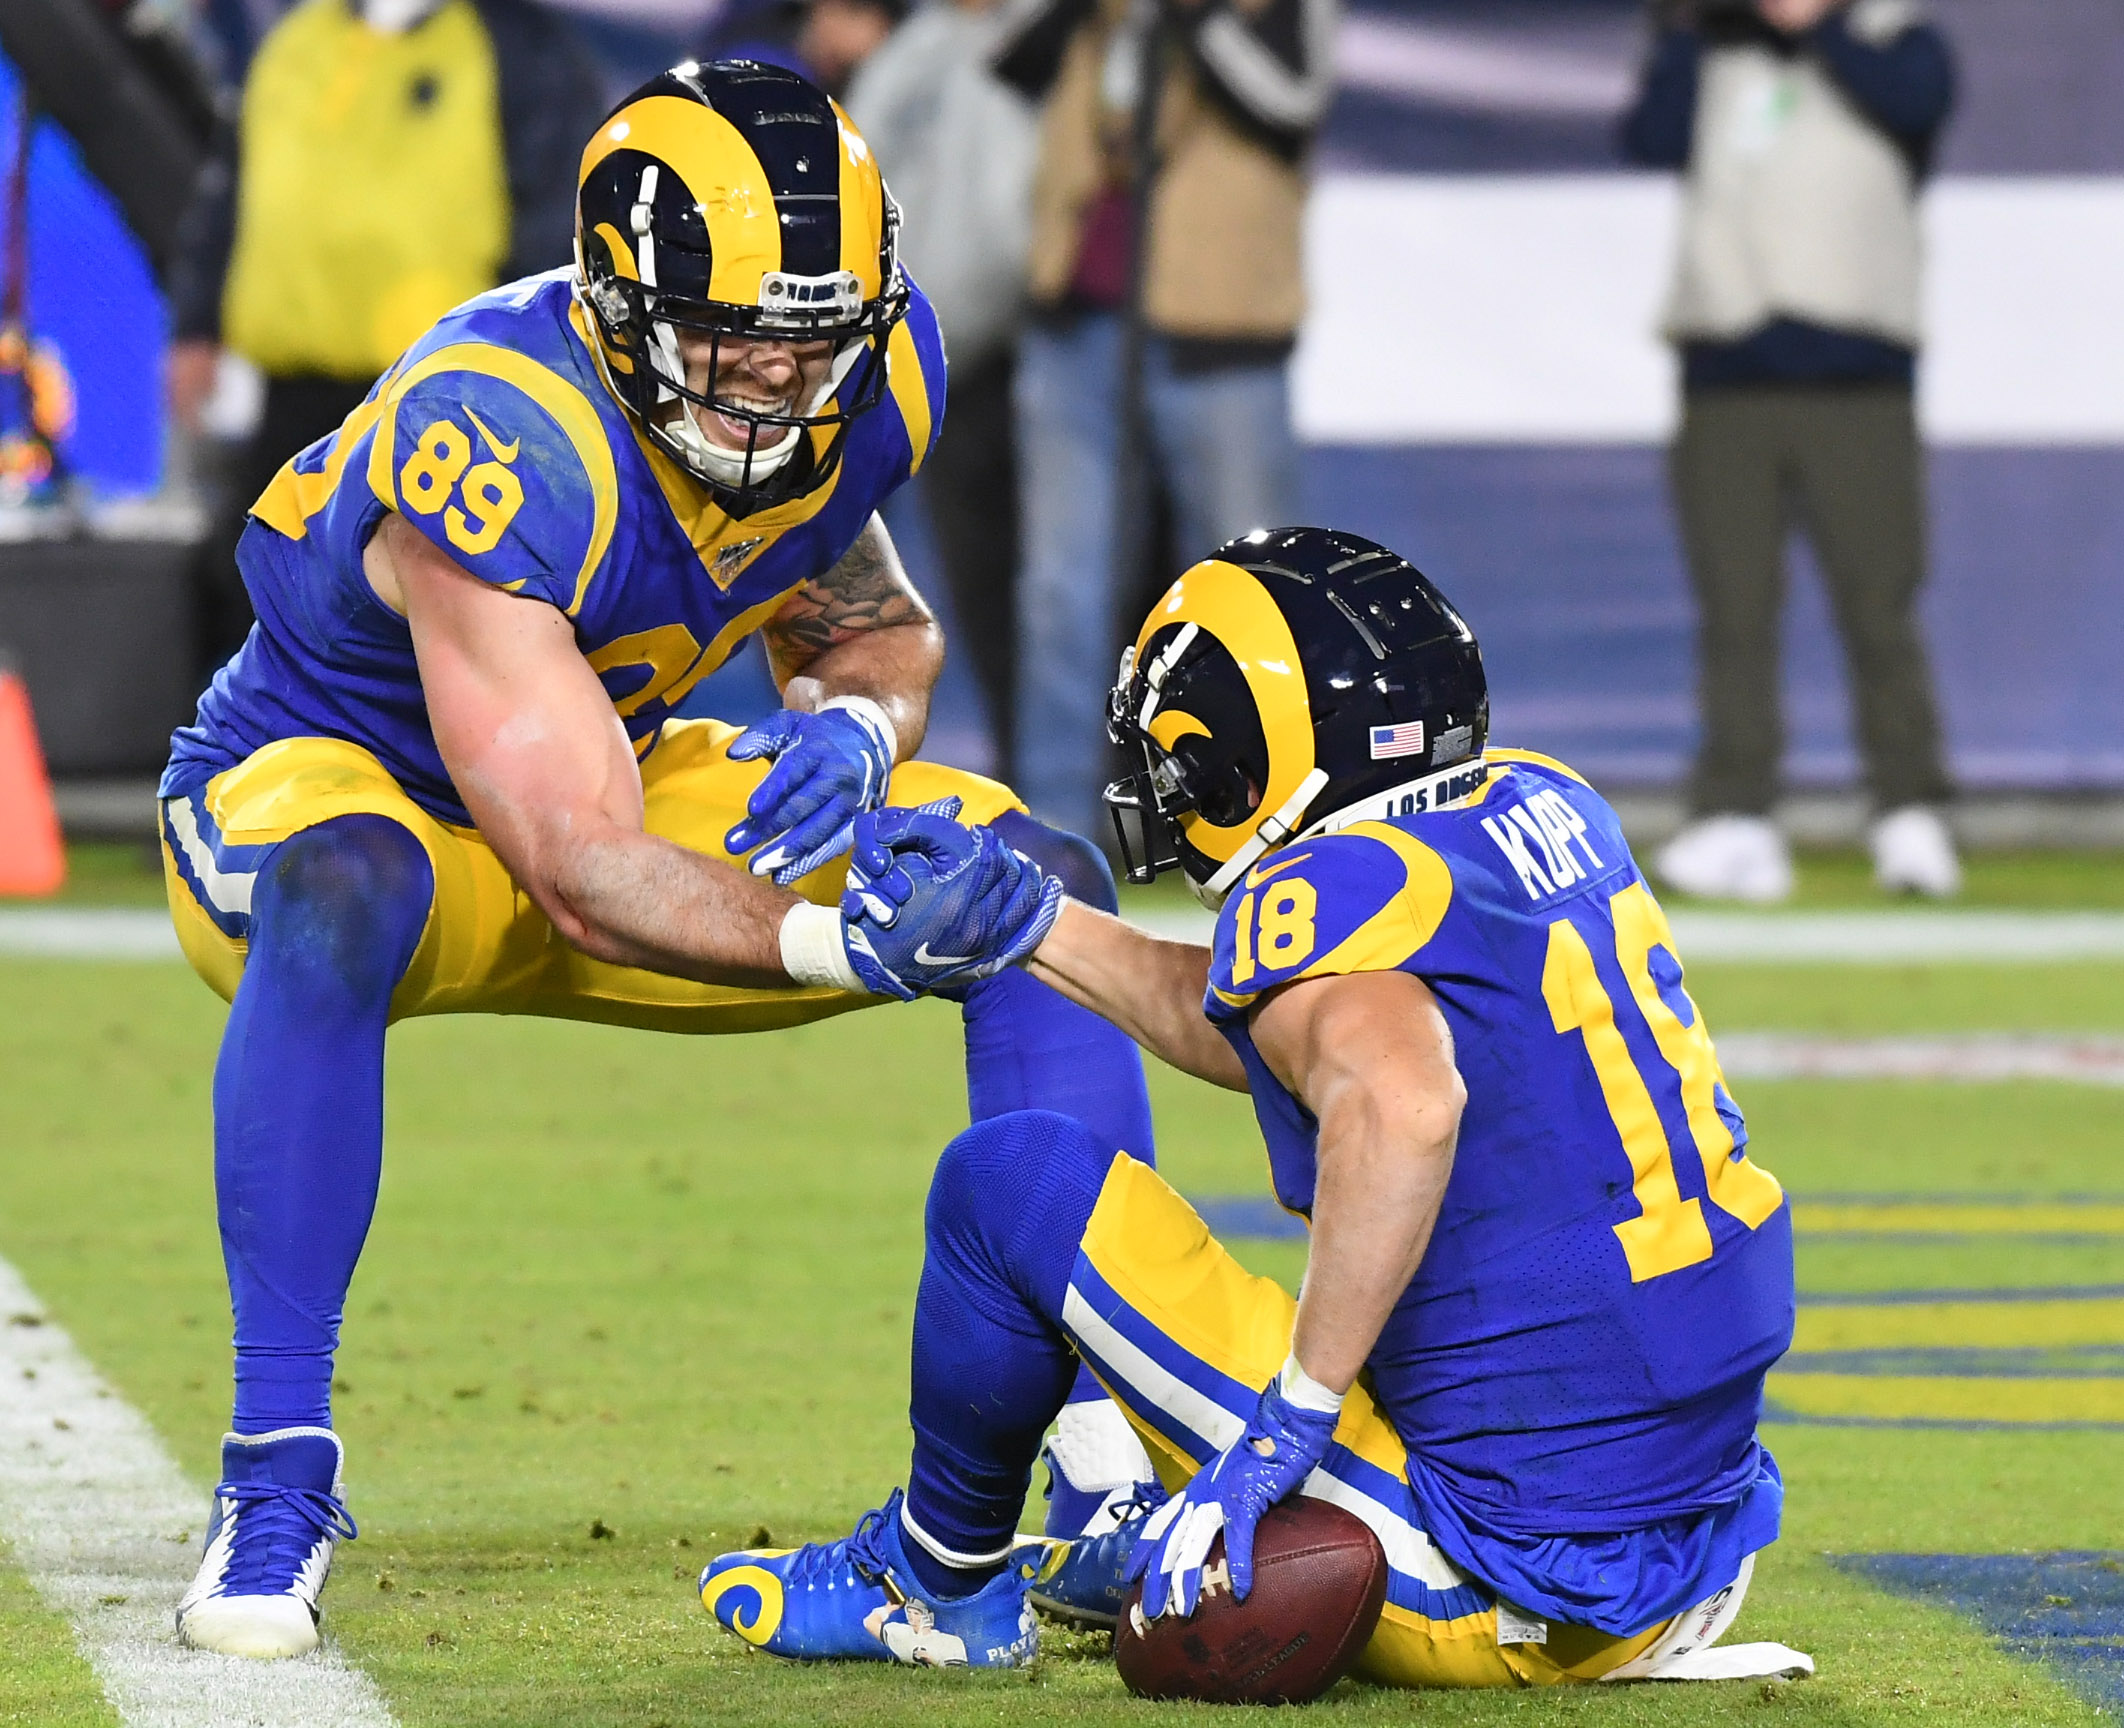 Los Angeles Rams TE Tyler Higbee helps WR Cooper Kupp after scoring a touchdown against the Seattle Seahawks in Week 14, Dec. 8, 2019.